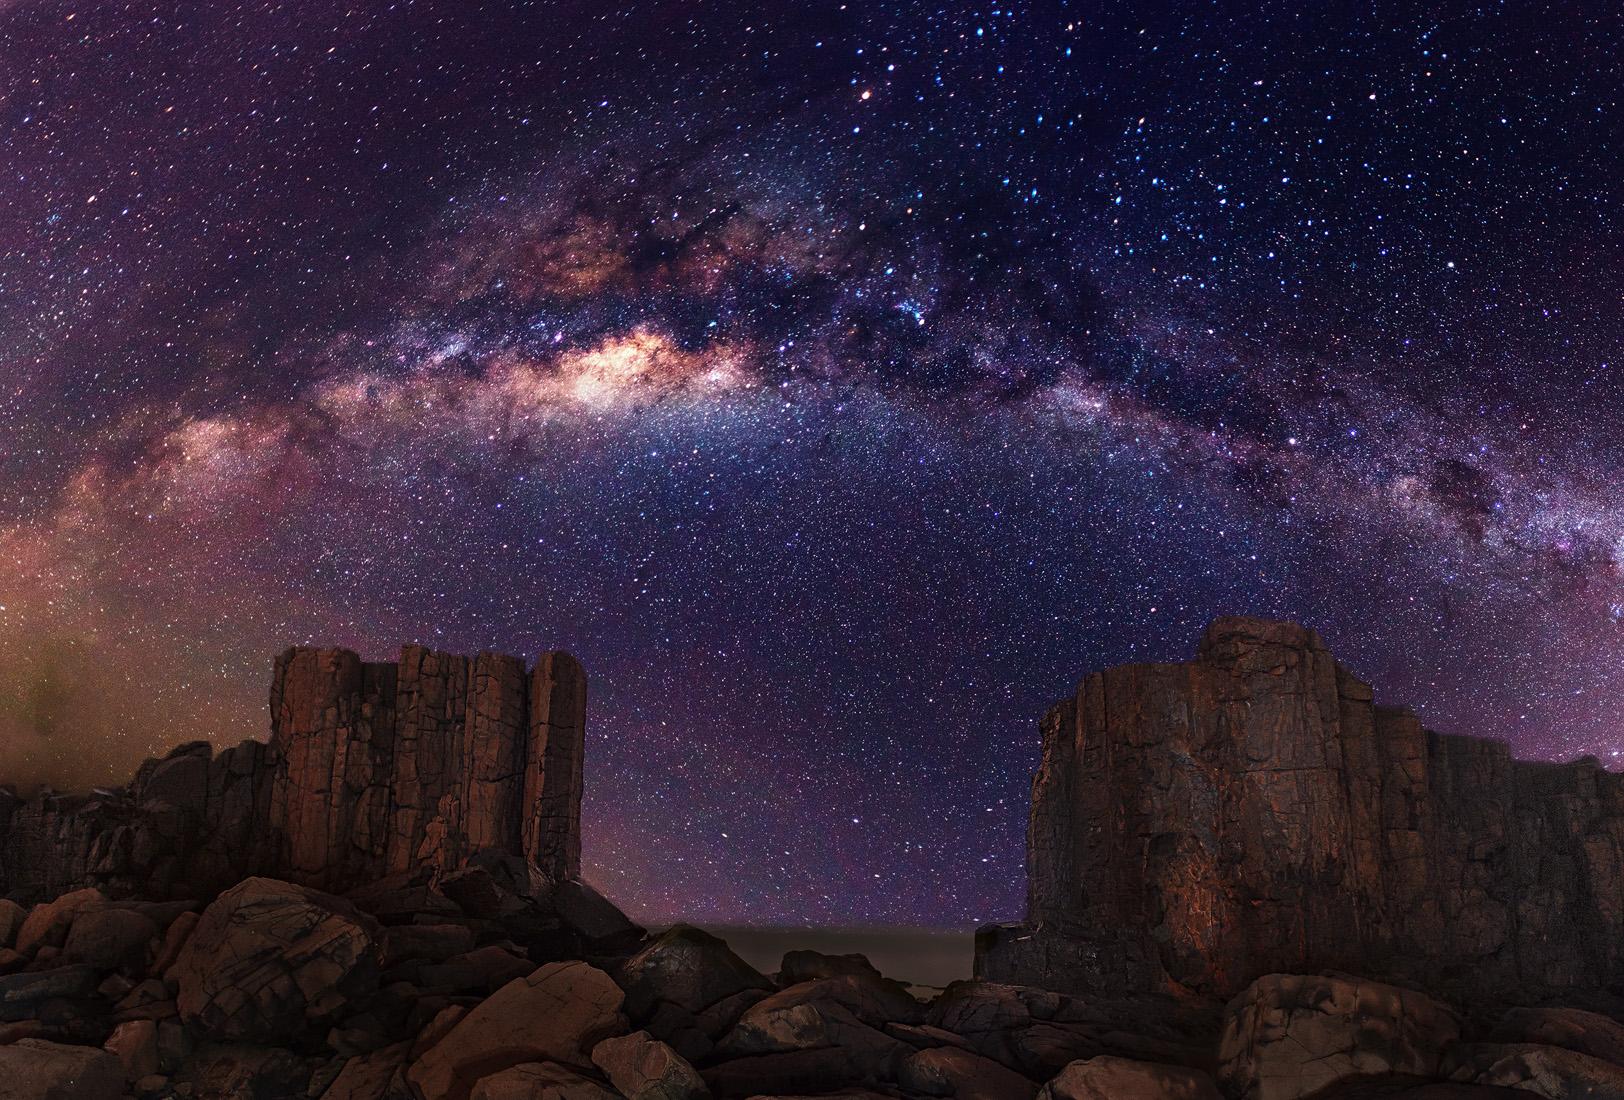 Galaxy Milky Way Stars Desert Night Rocks Stones wallpaper background 1624x1100